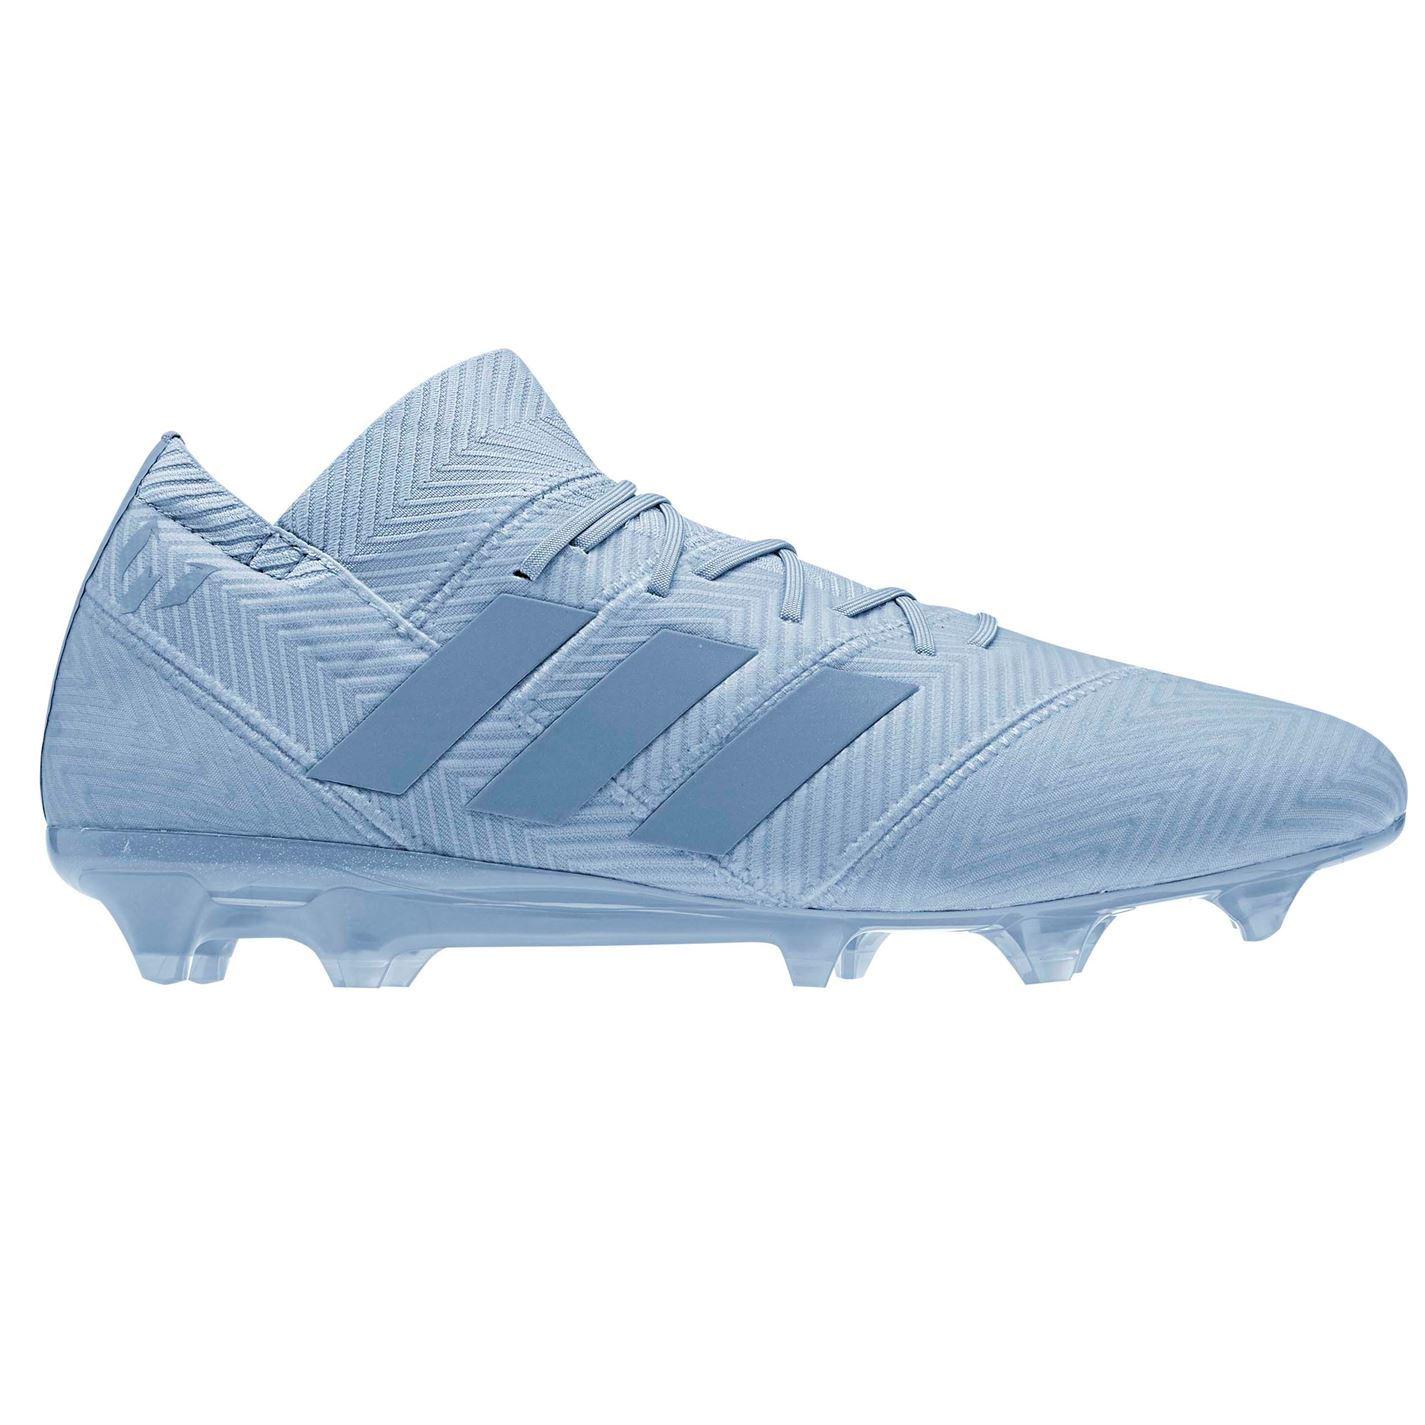 wholesale dealer 447d6 a7990 ... Adidas Nemeziz Messi 1 8.1 FG firma tierra fútbol botas Mens Soccer  zapatos tacos ...